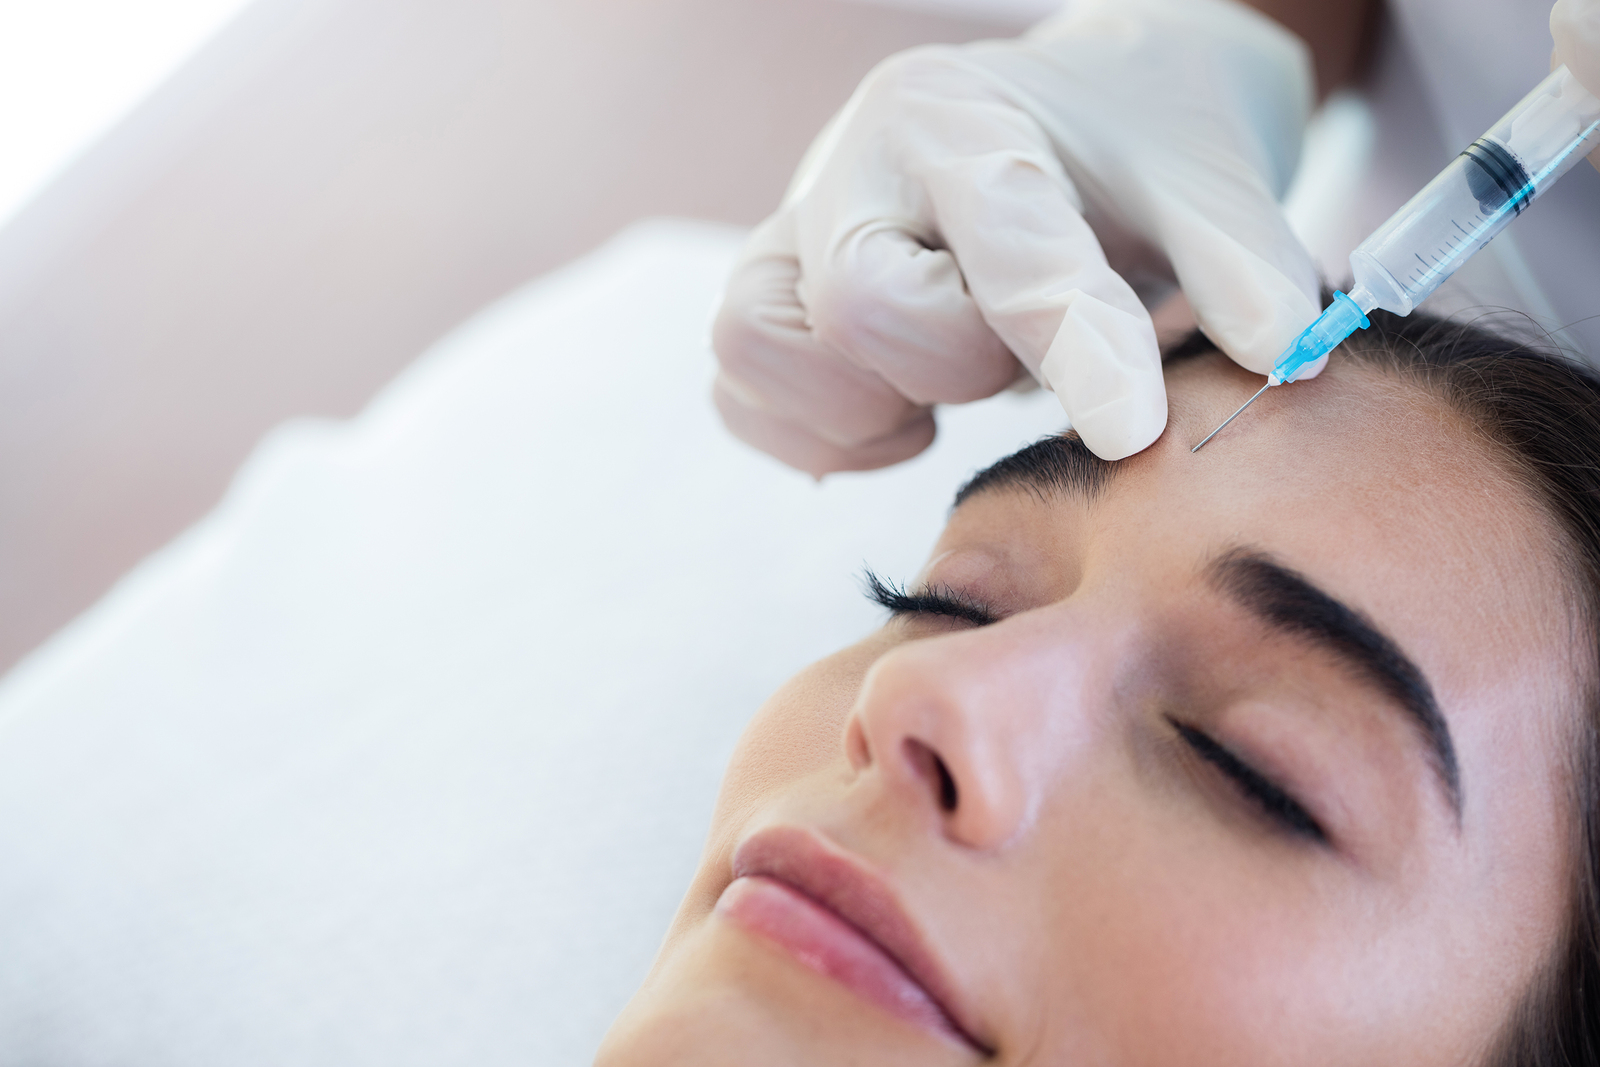 bigstock-Woman-receiving-botox-injectio-123751928.jpg